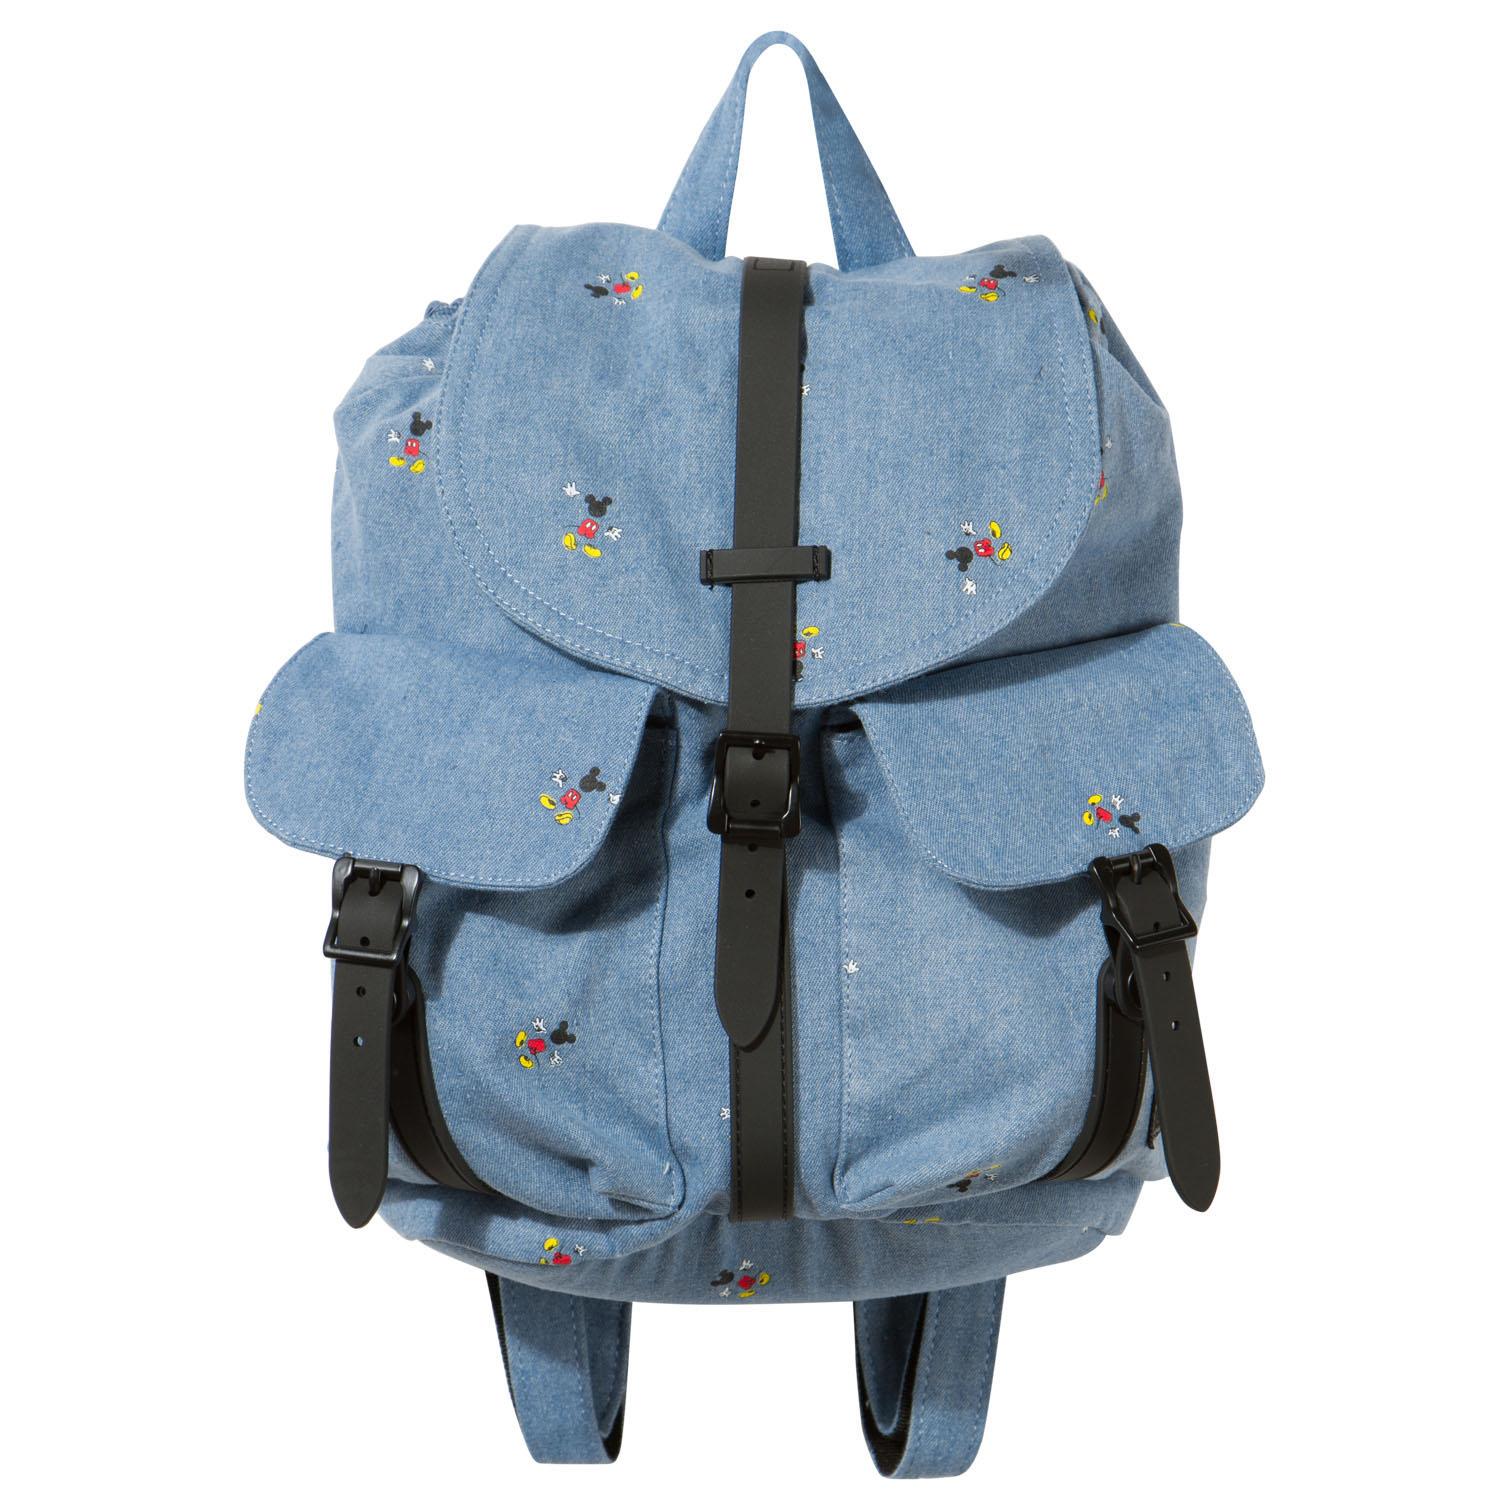 c03d3f78e8bb Back to School   School Bags - Ray   Robin